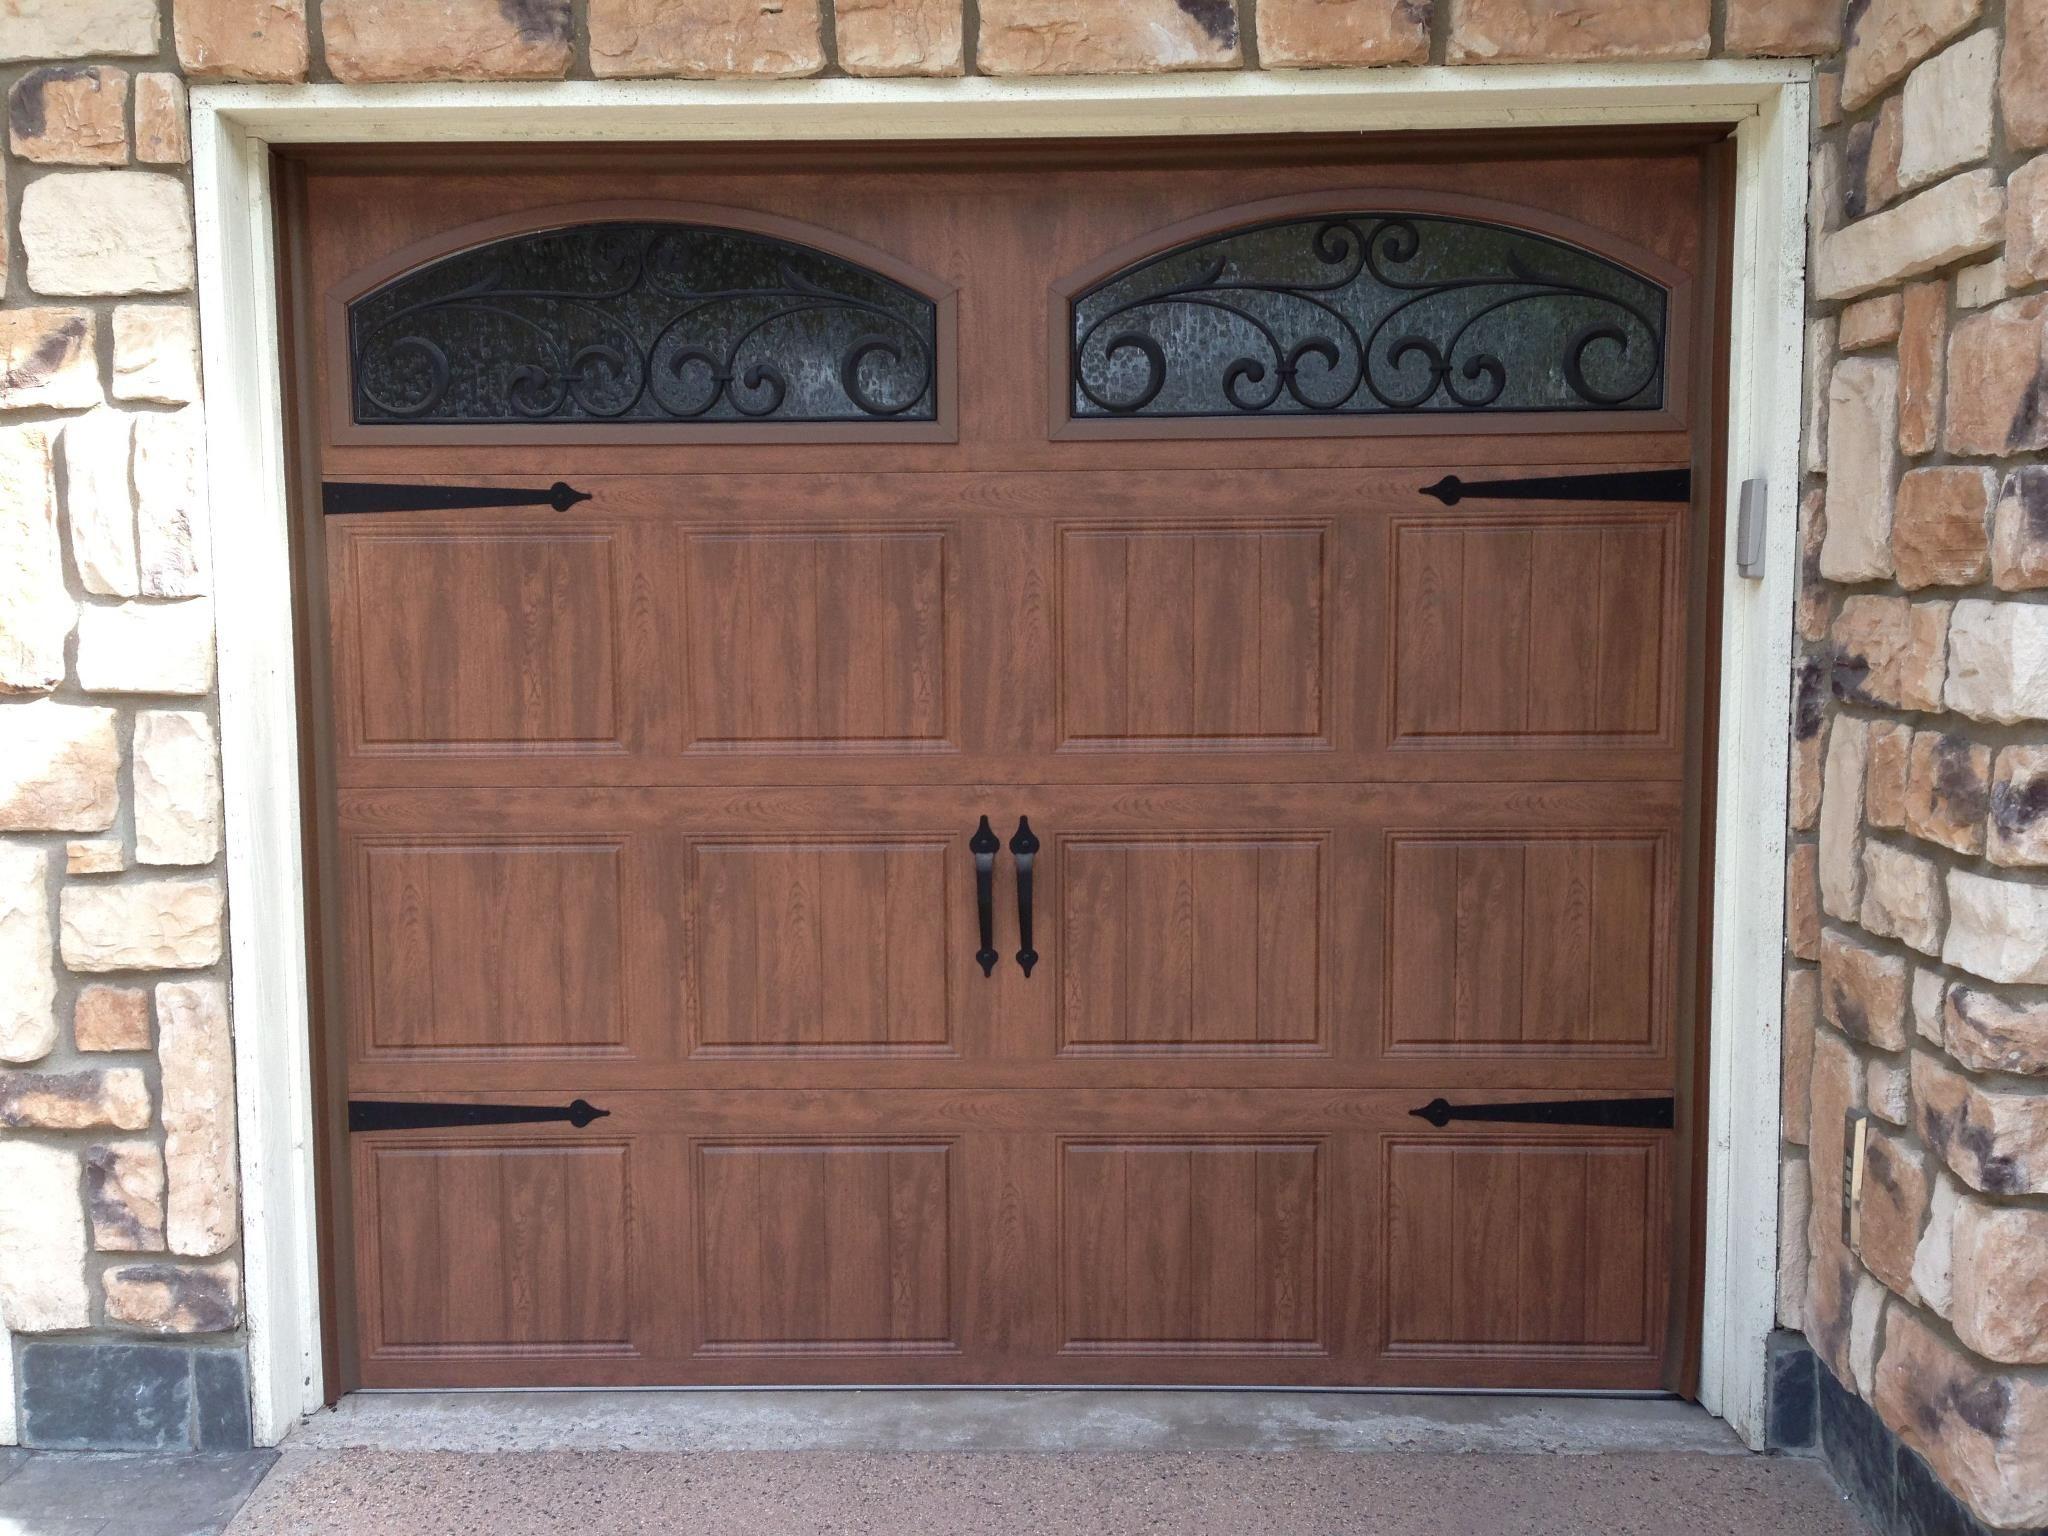 doors modern clopay ny aluminum collection nj door with stott glass architecture avante garage